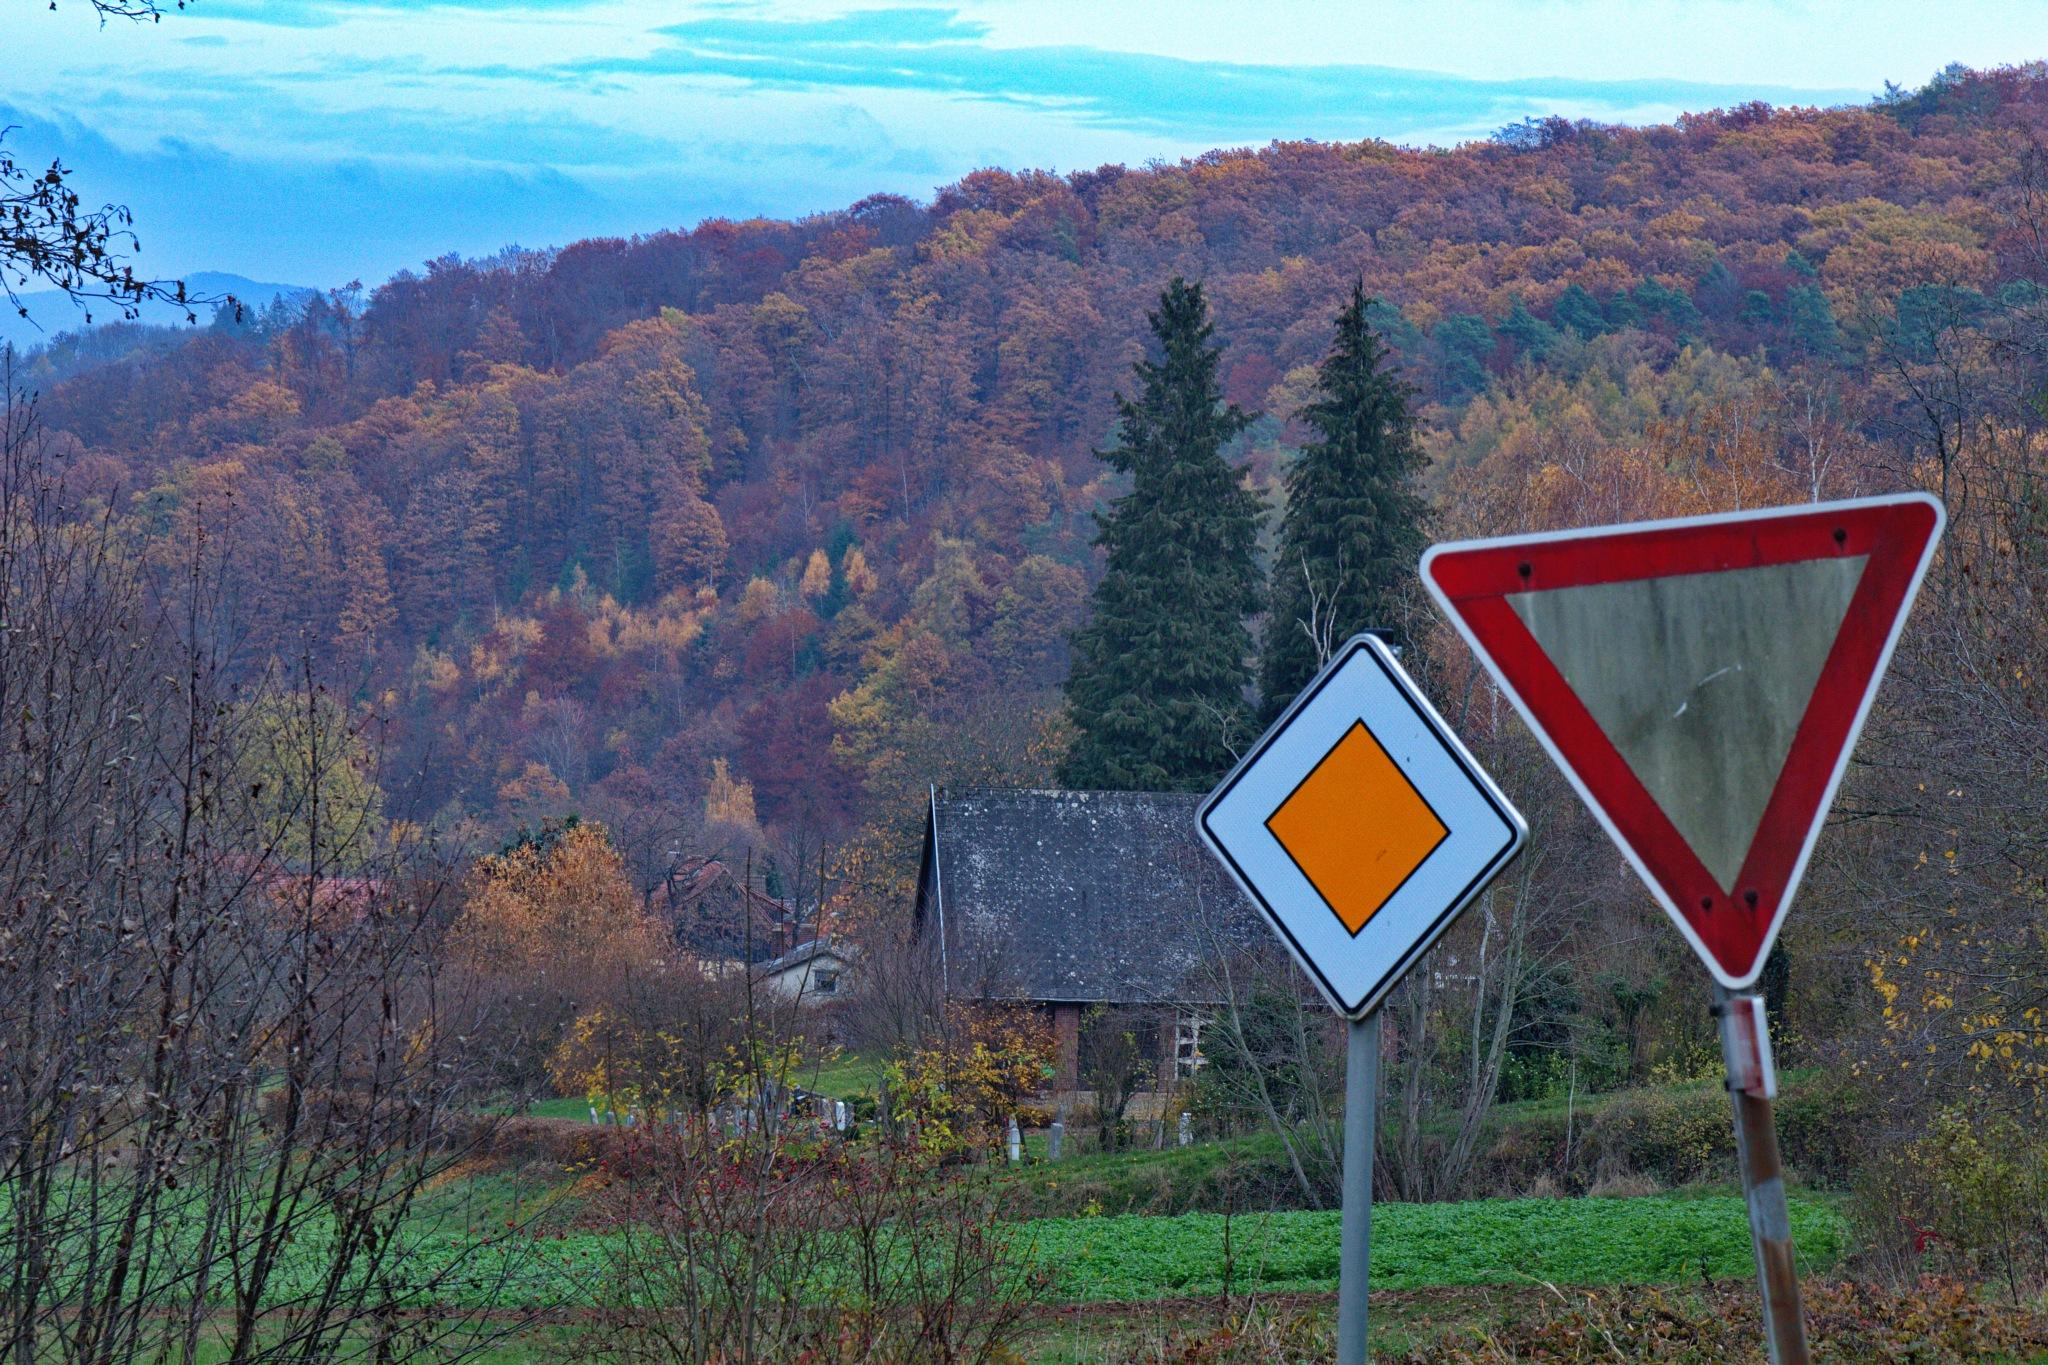 Herbst by Rolf-Dieter Balindt